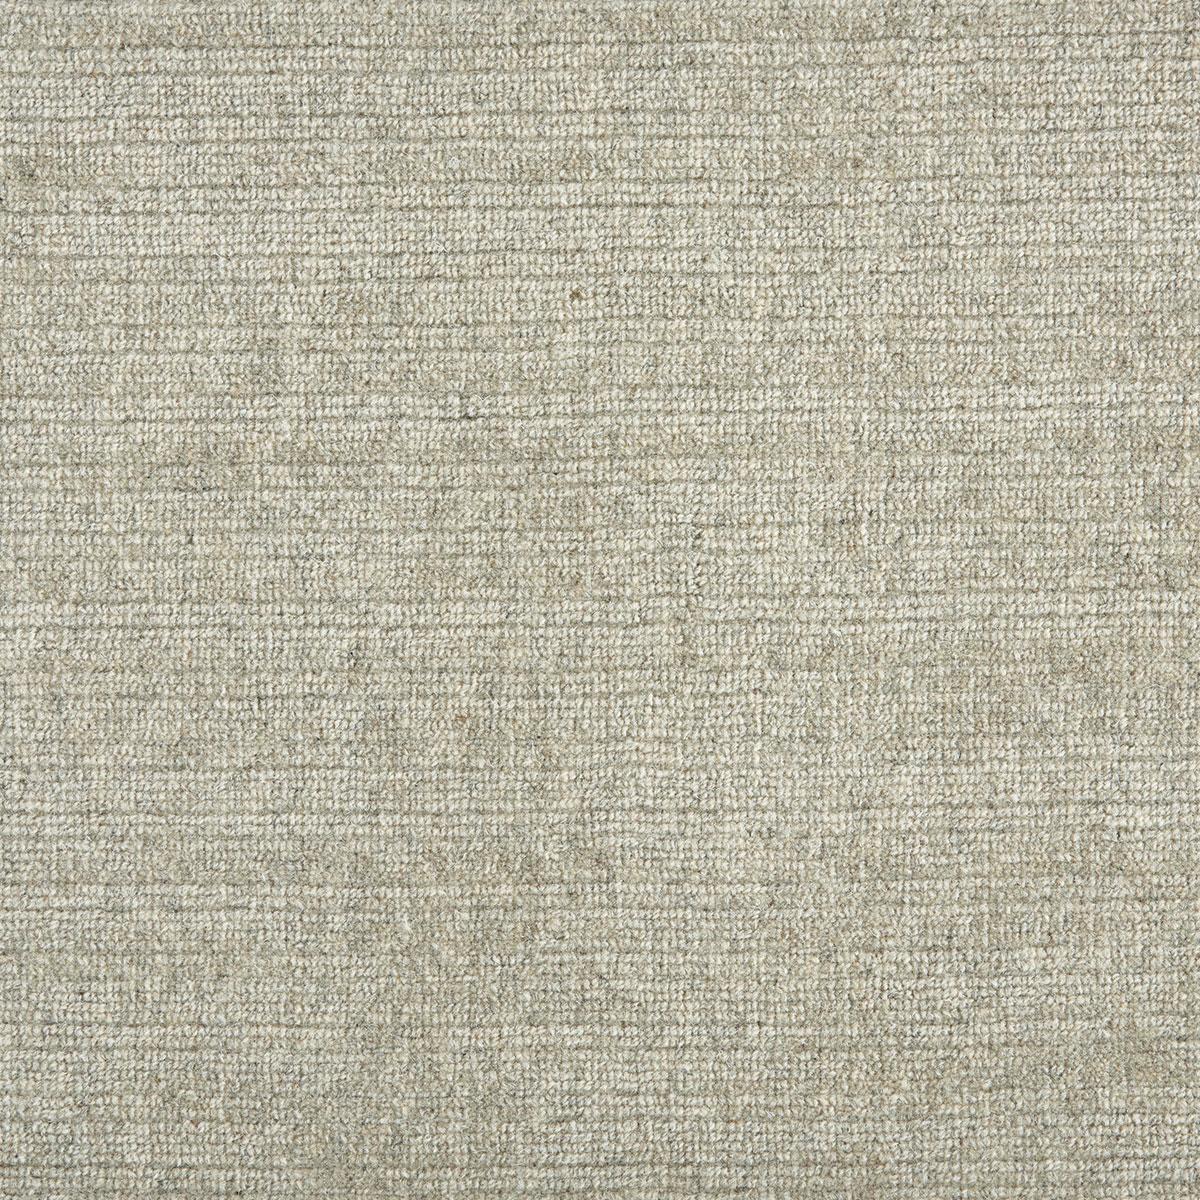 Torano Luxyury  Rug   Pattersom Flynn Martin Custom Rugs